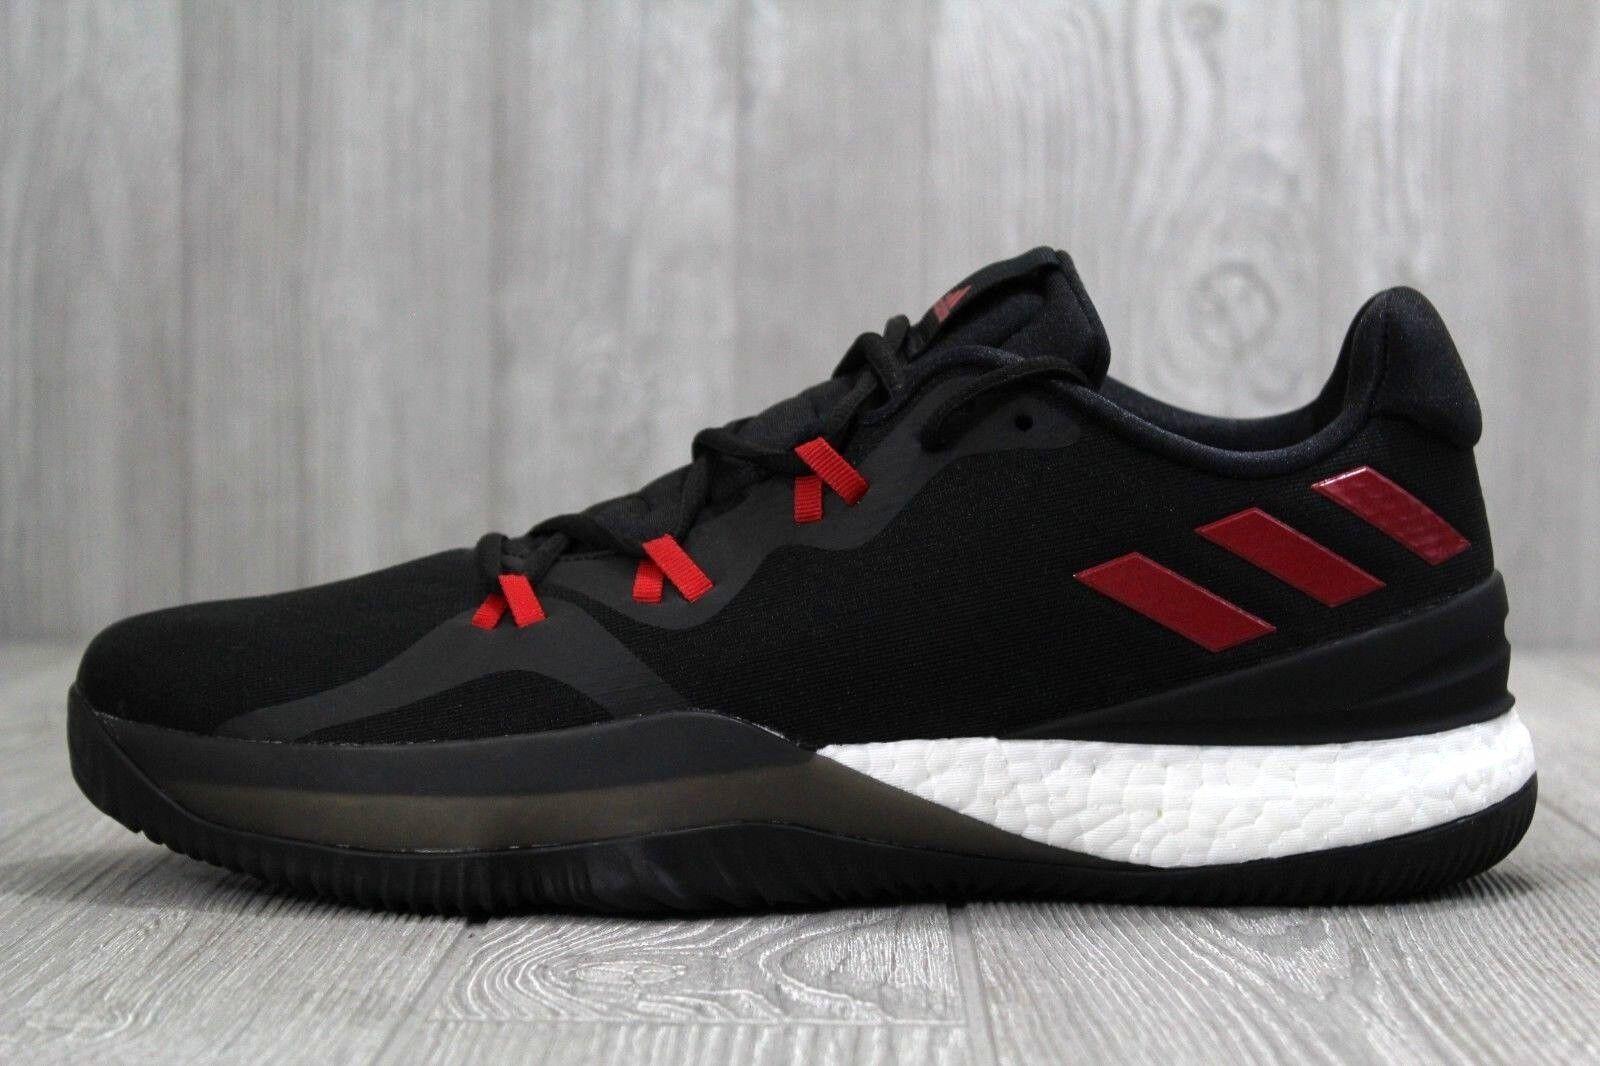 33 adidas verrückte licht fördern bis 2018 schwarz basketball / rot 2 niedrig basketball schwarz - schuhe sz. 1b944c